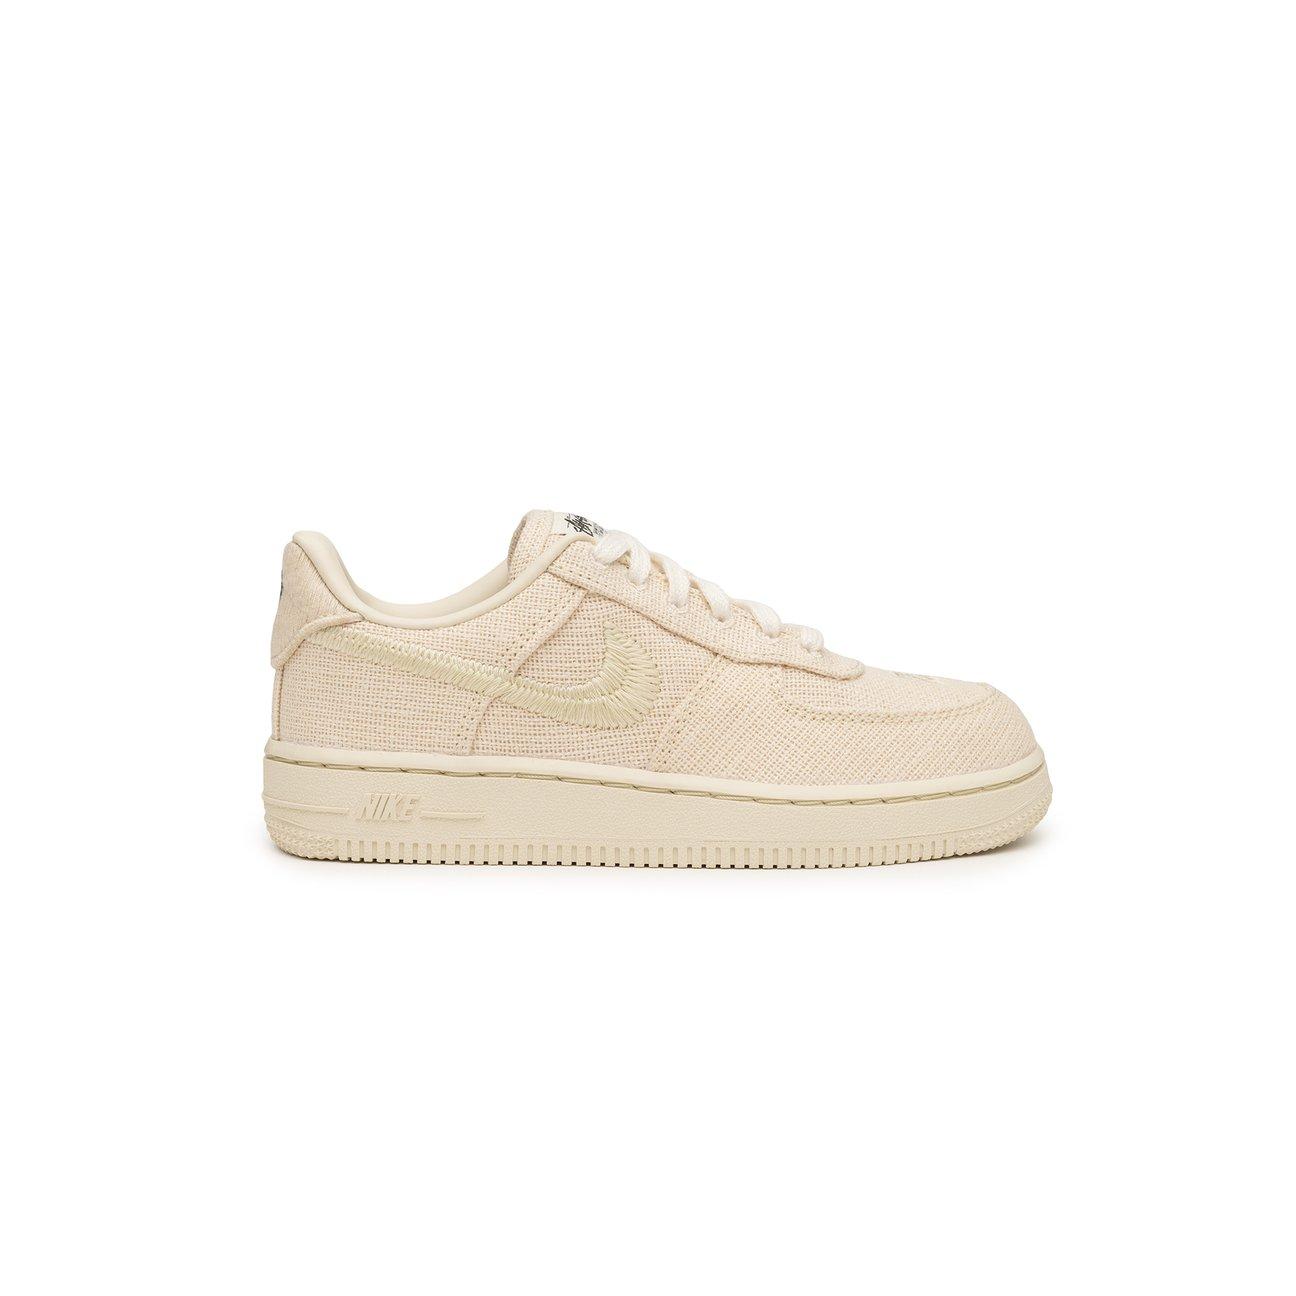 air force 1 blanche et beige